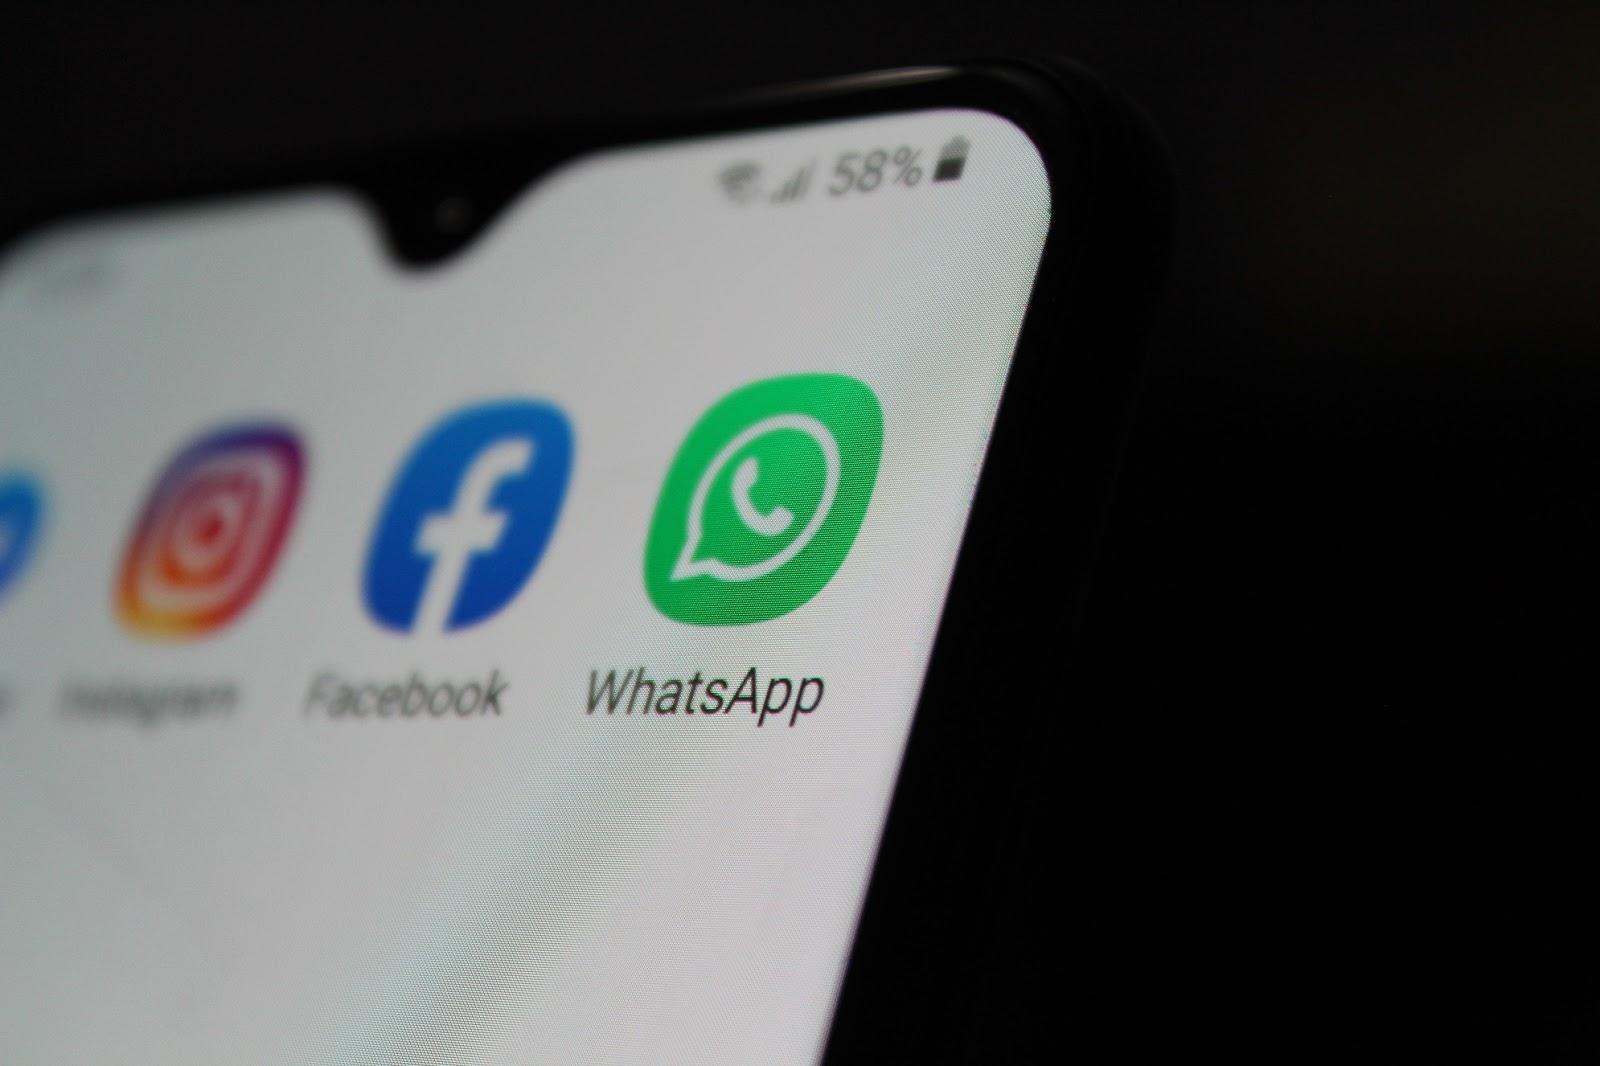 WhatsApp boasts over 2 billion users worldwide